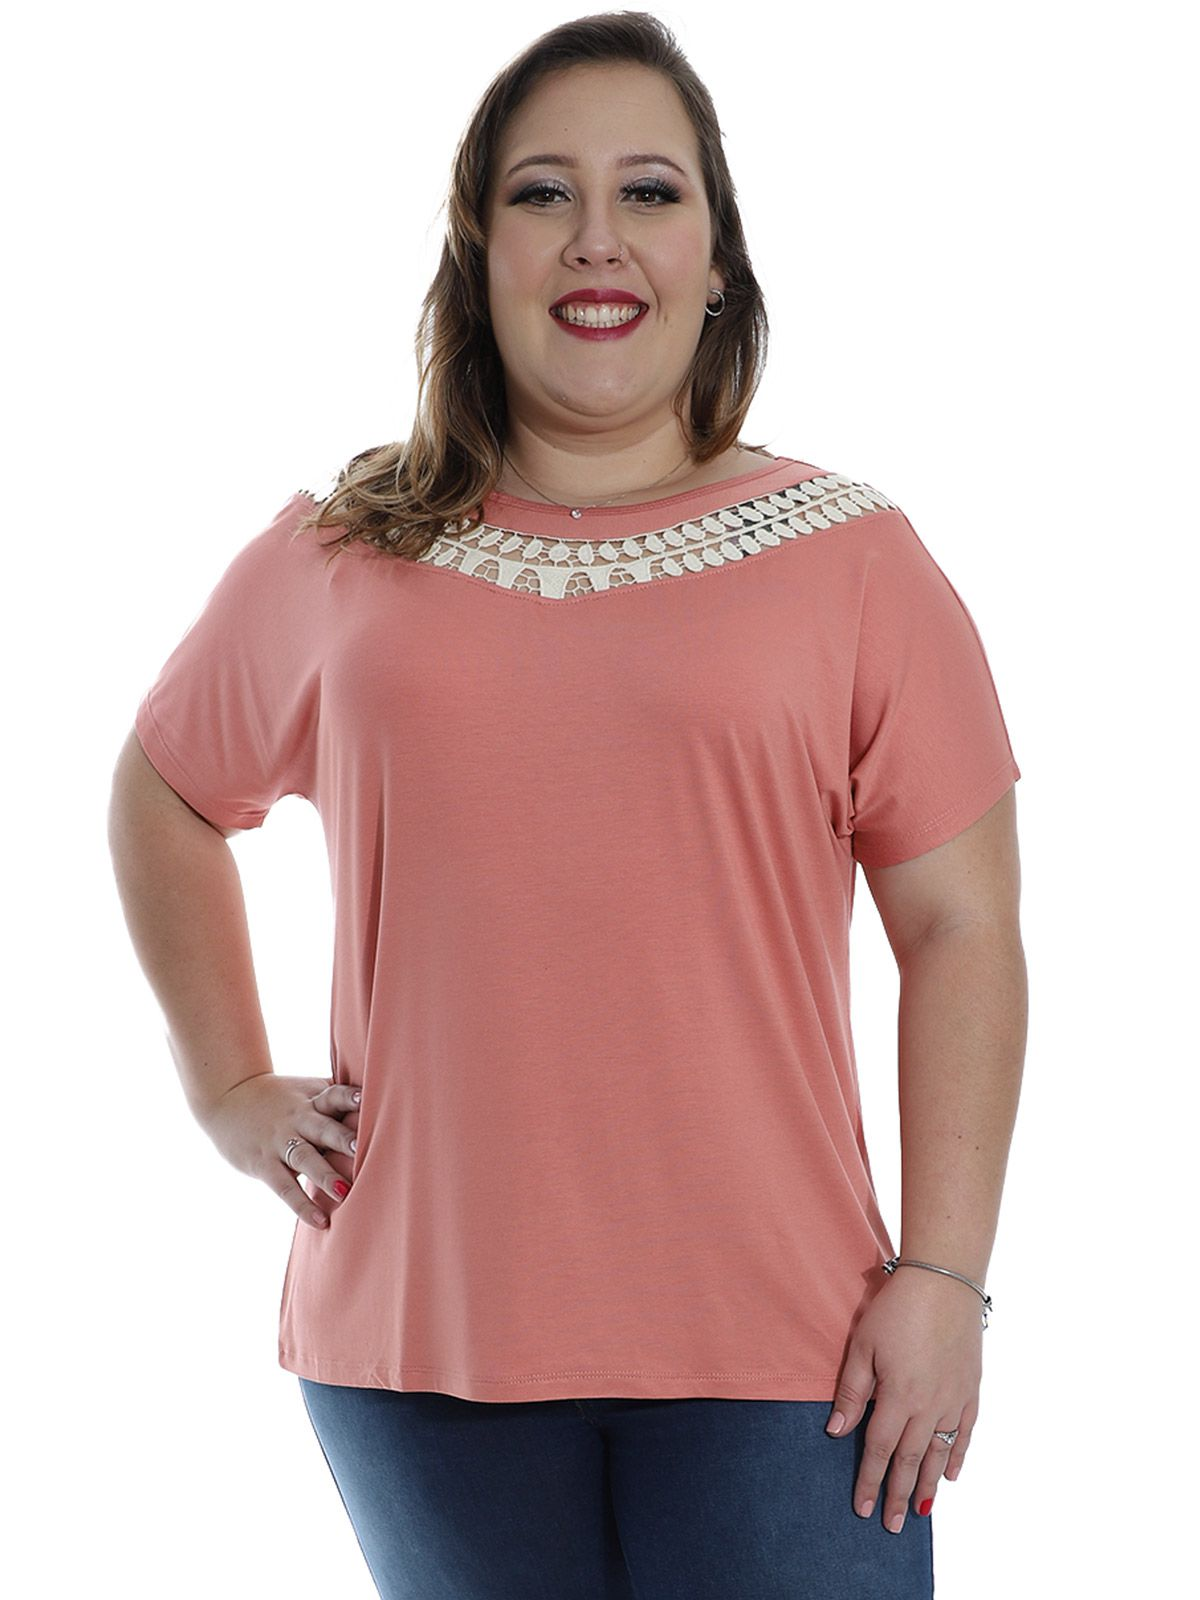 Blusa Plus Size Decote com Renda de Guipir KTS Rosa